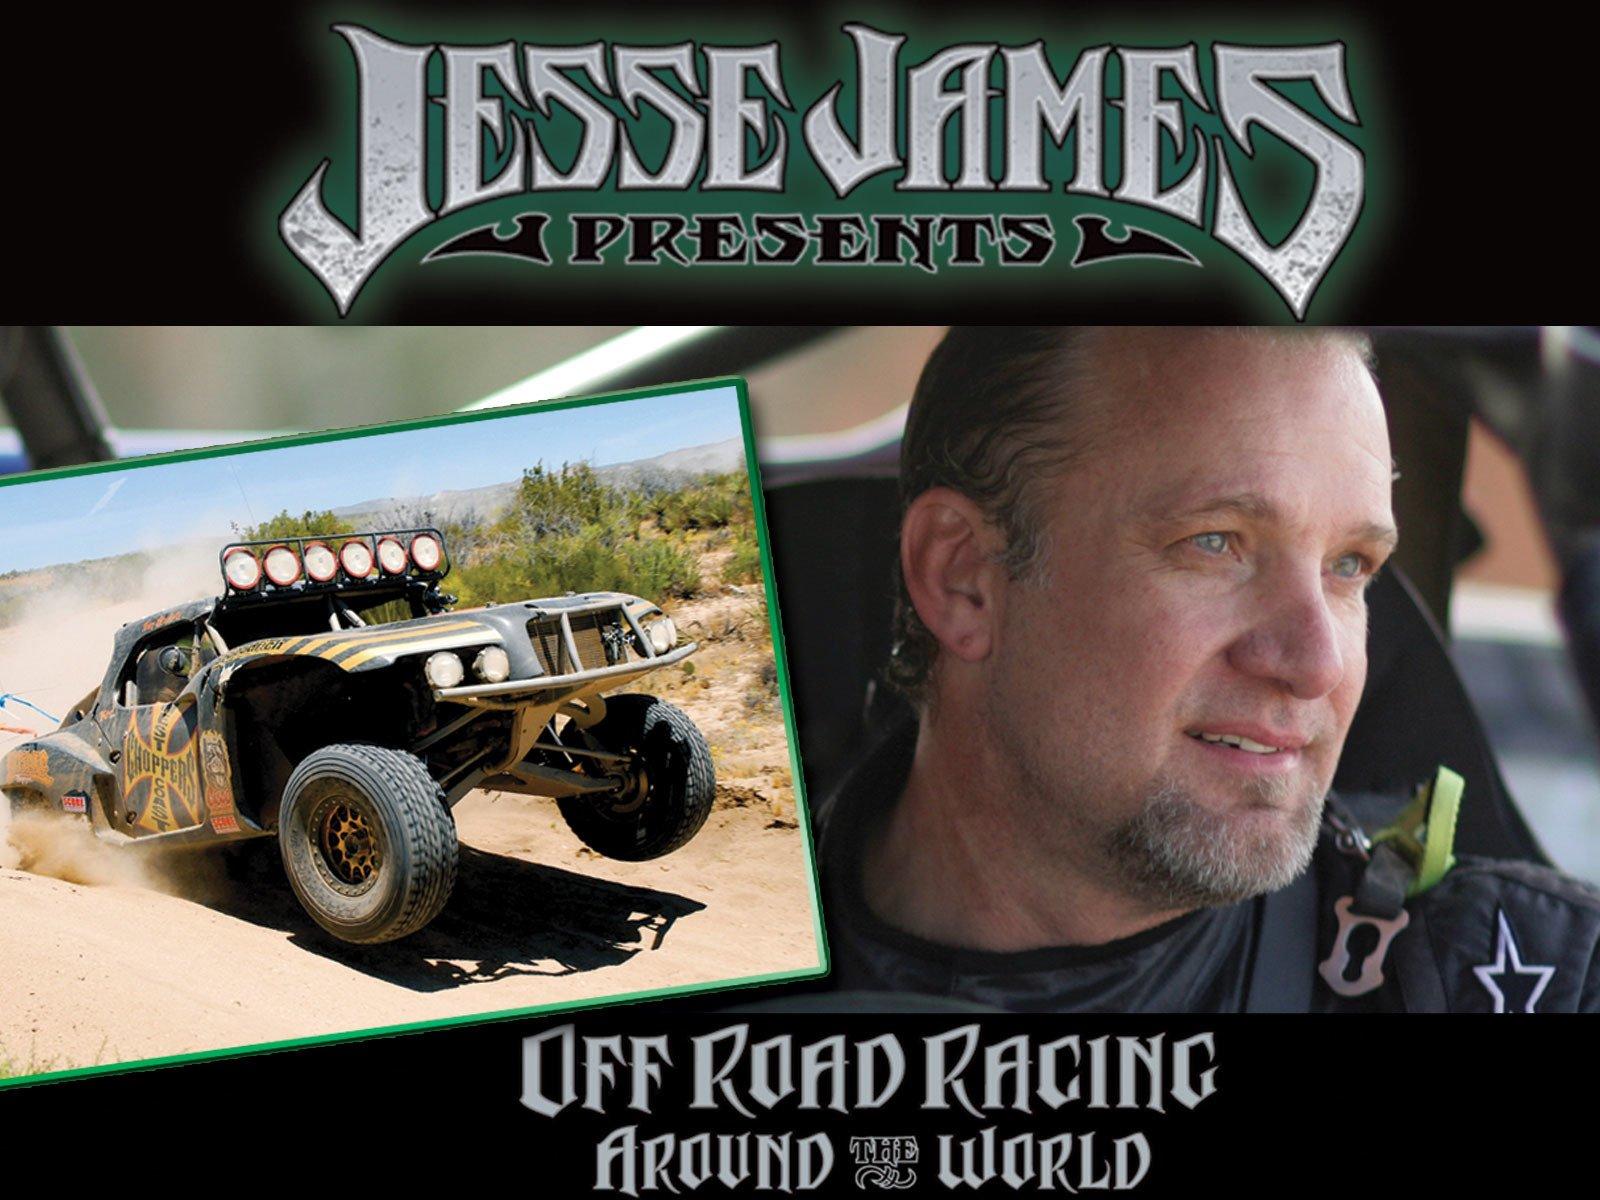 Jesse James Off Road Racing - Season 1